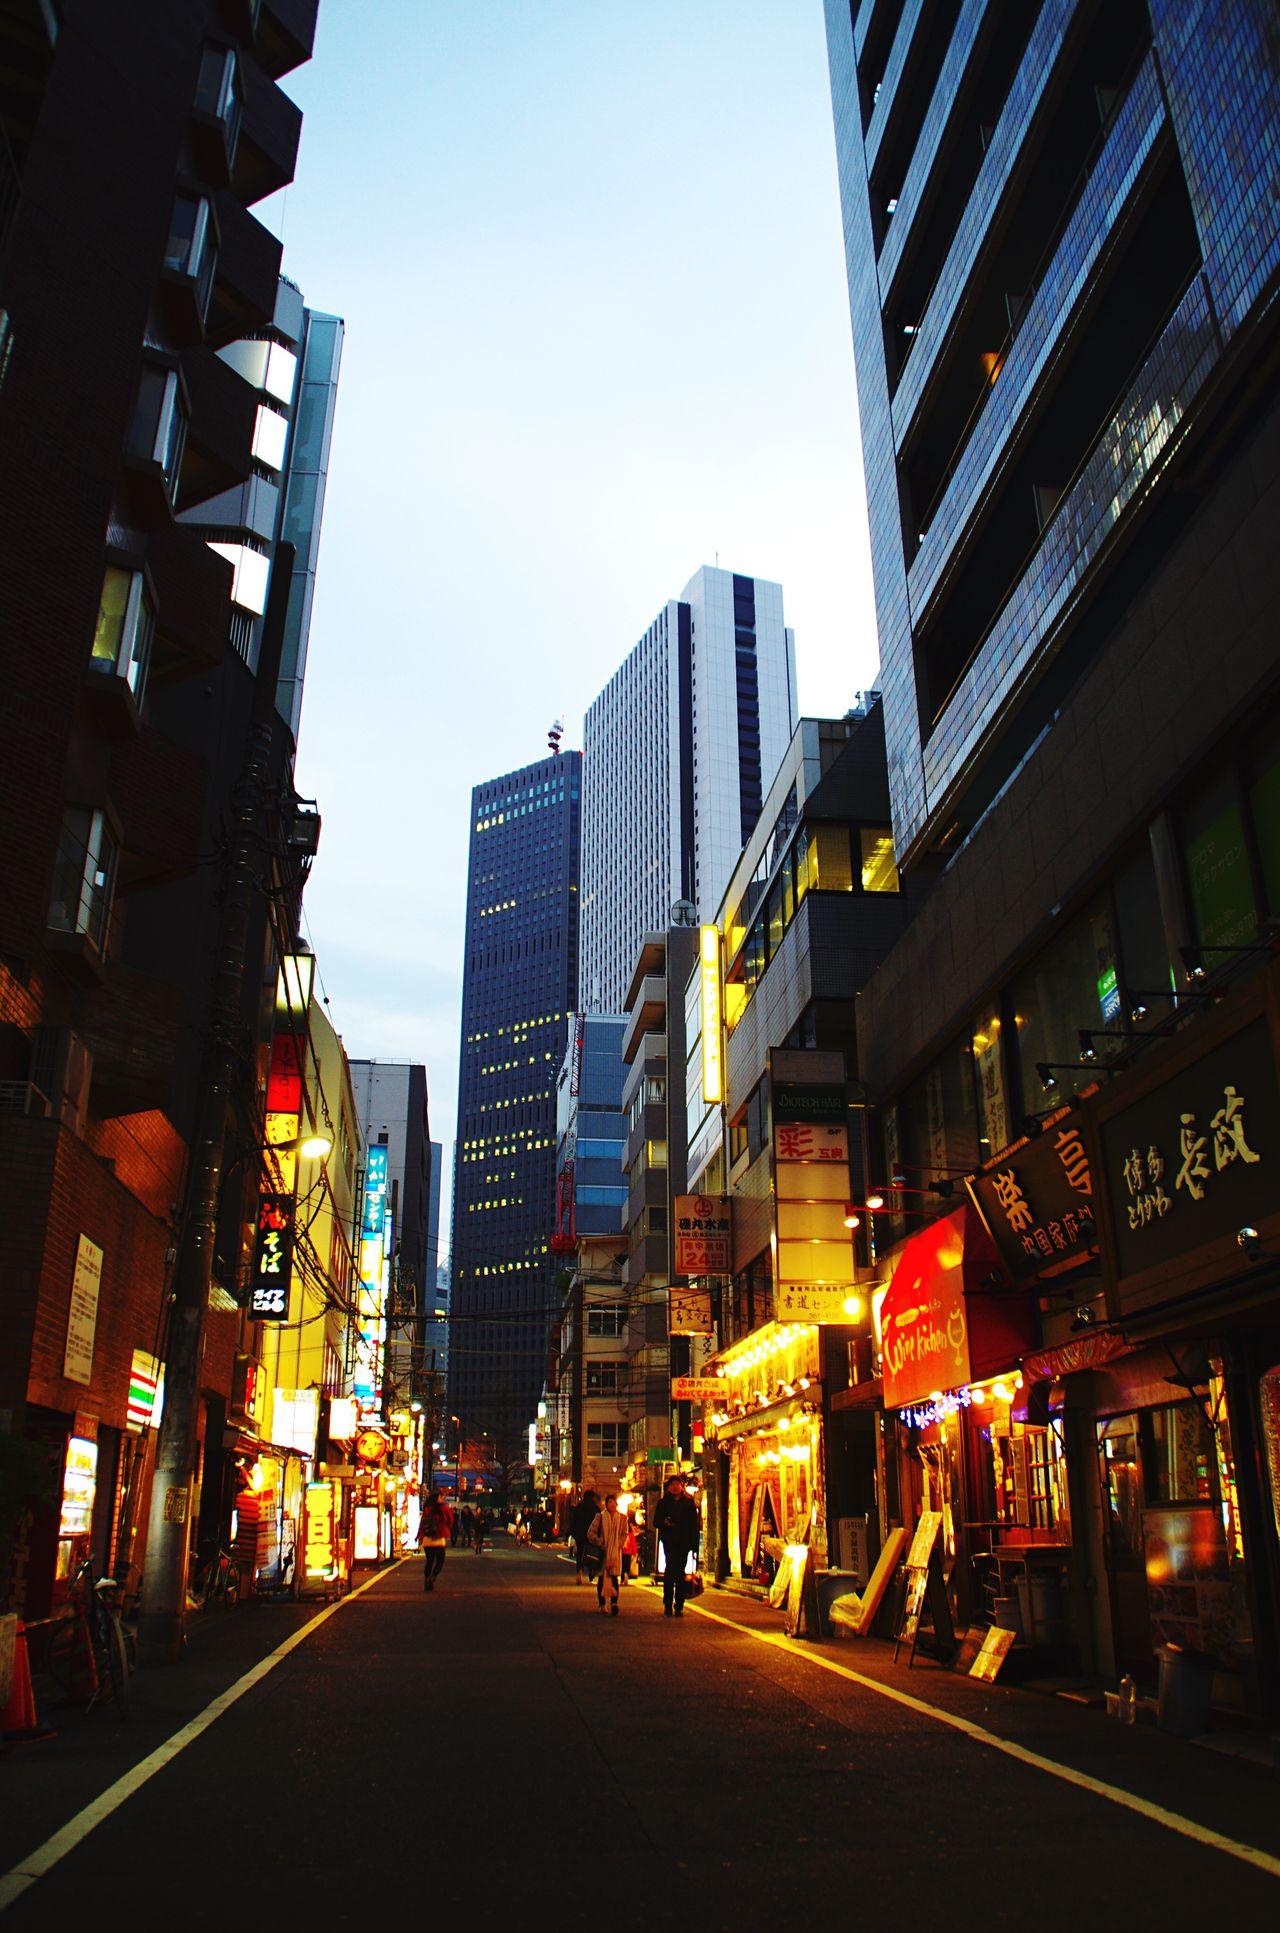 Building Exterior Illuminated City Architecture Built Structure Sky Outdoors Skyscraper No People Night SHINJYUKU Japan